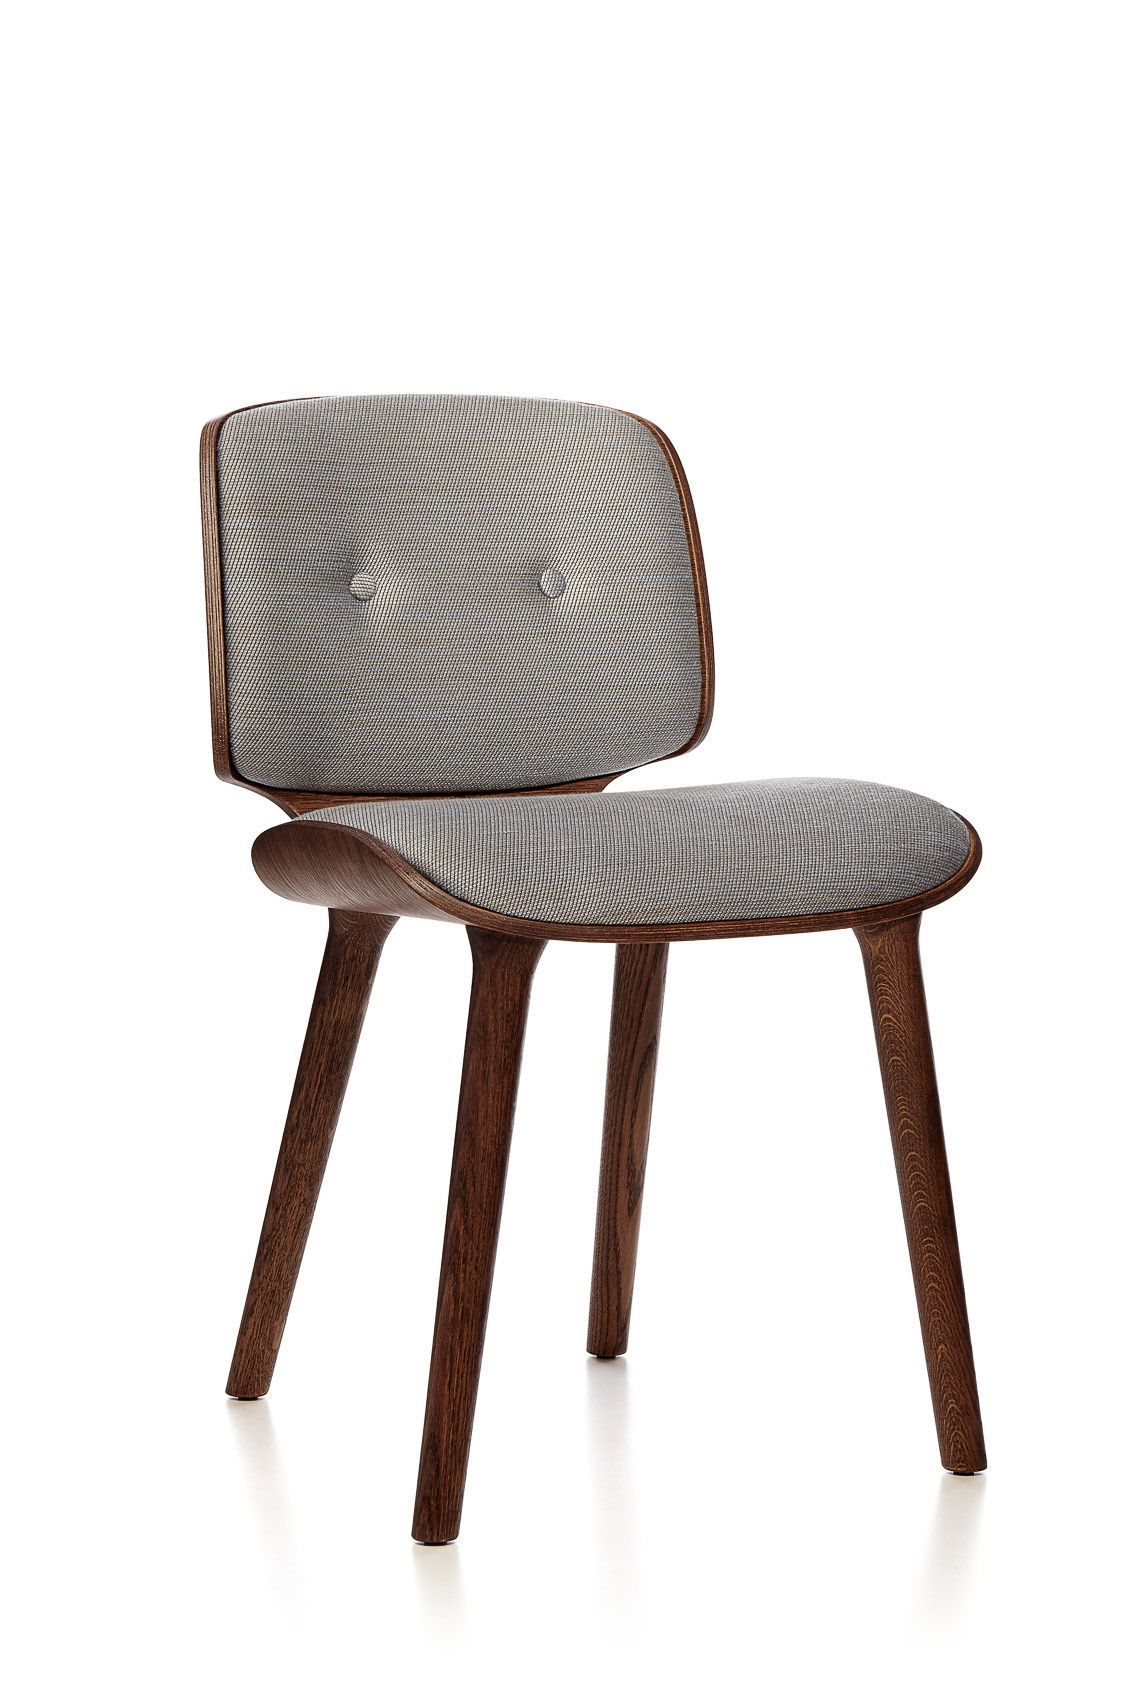 Nut Dining Chair By Marcel Wanders. Cute!